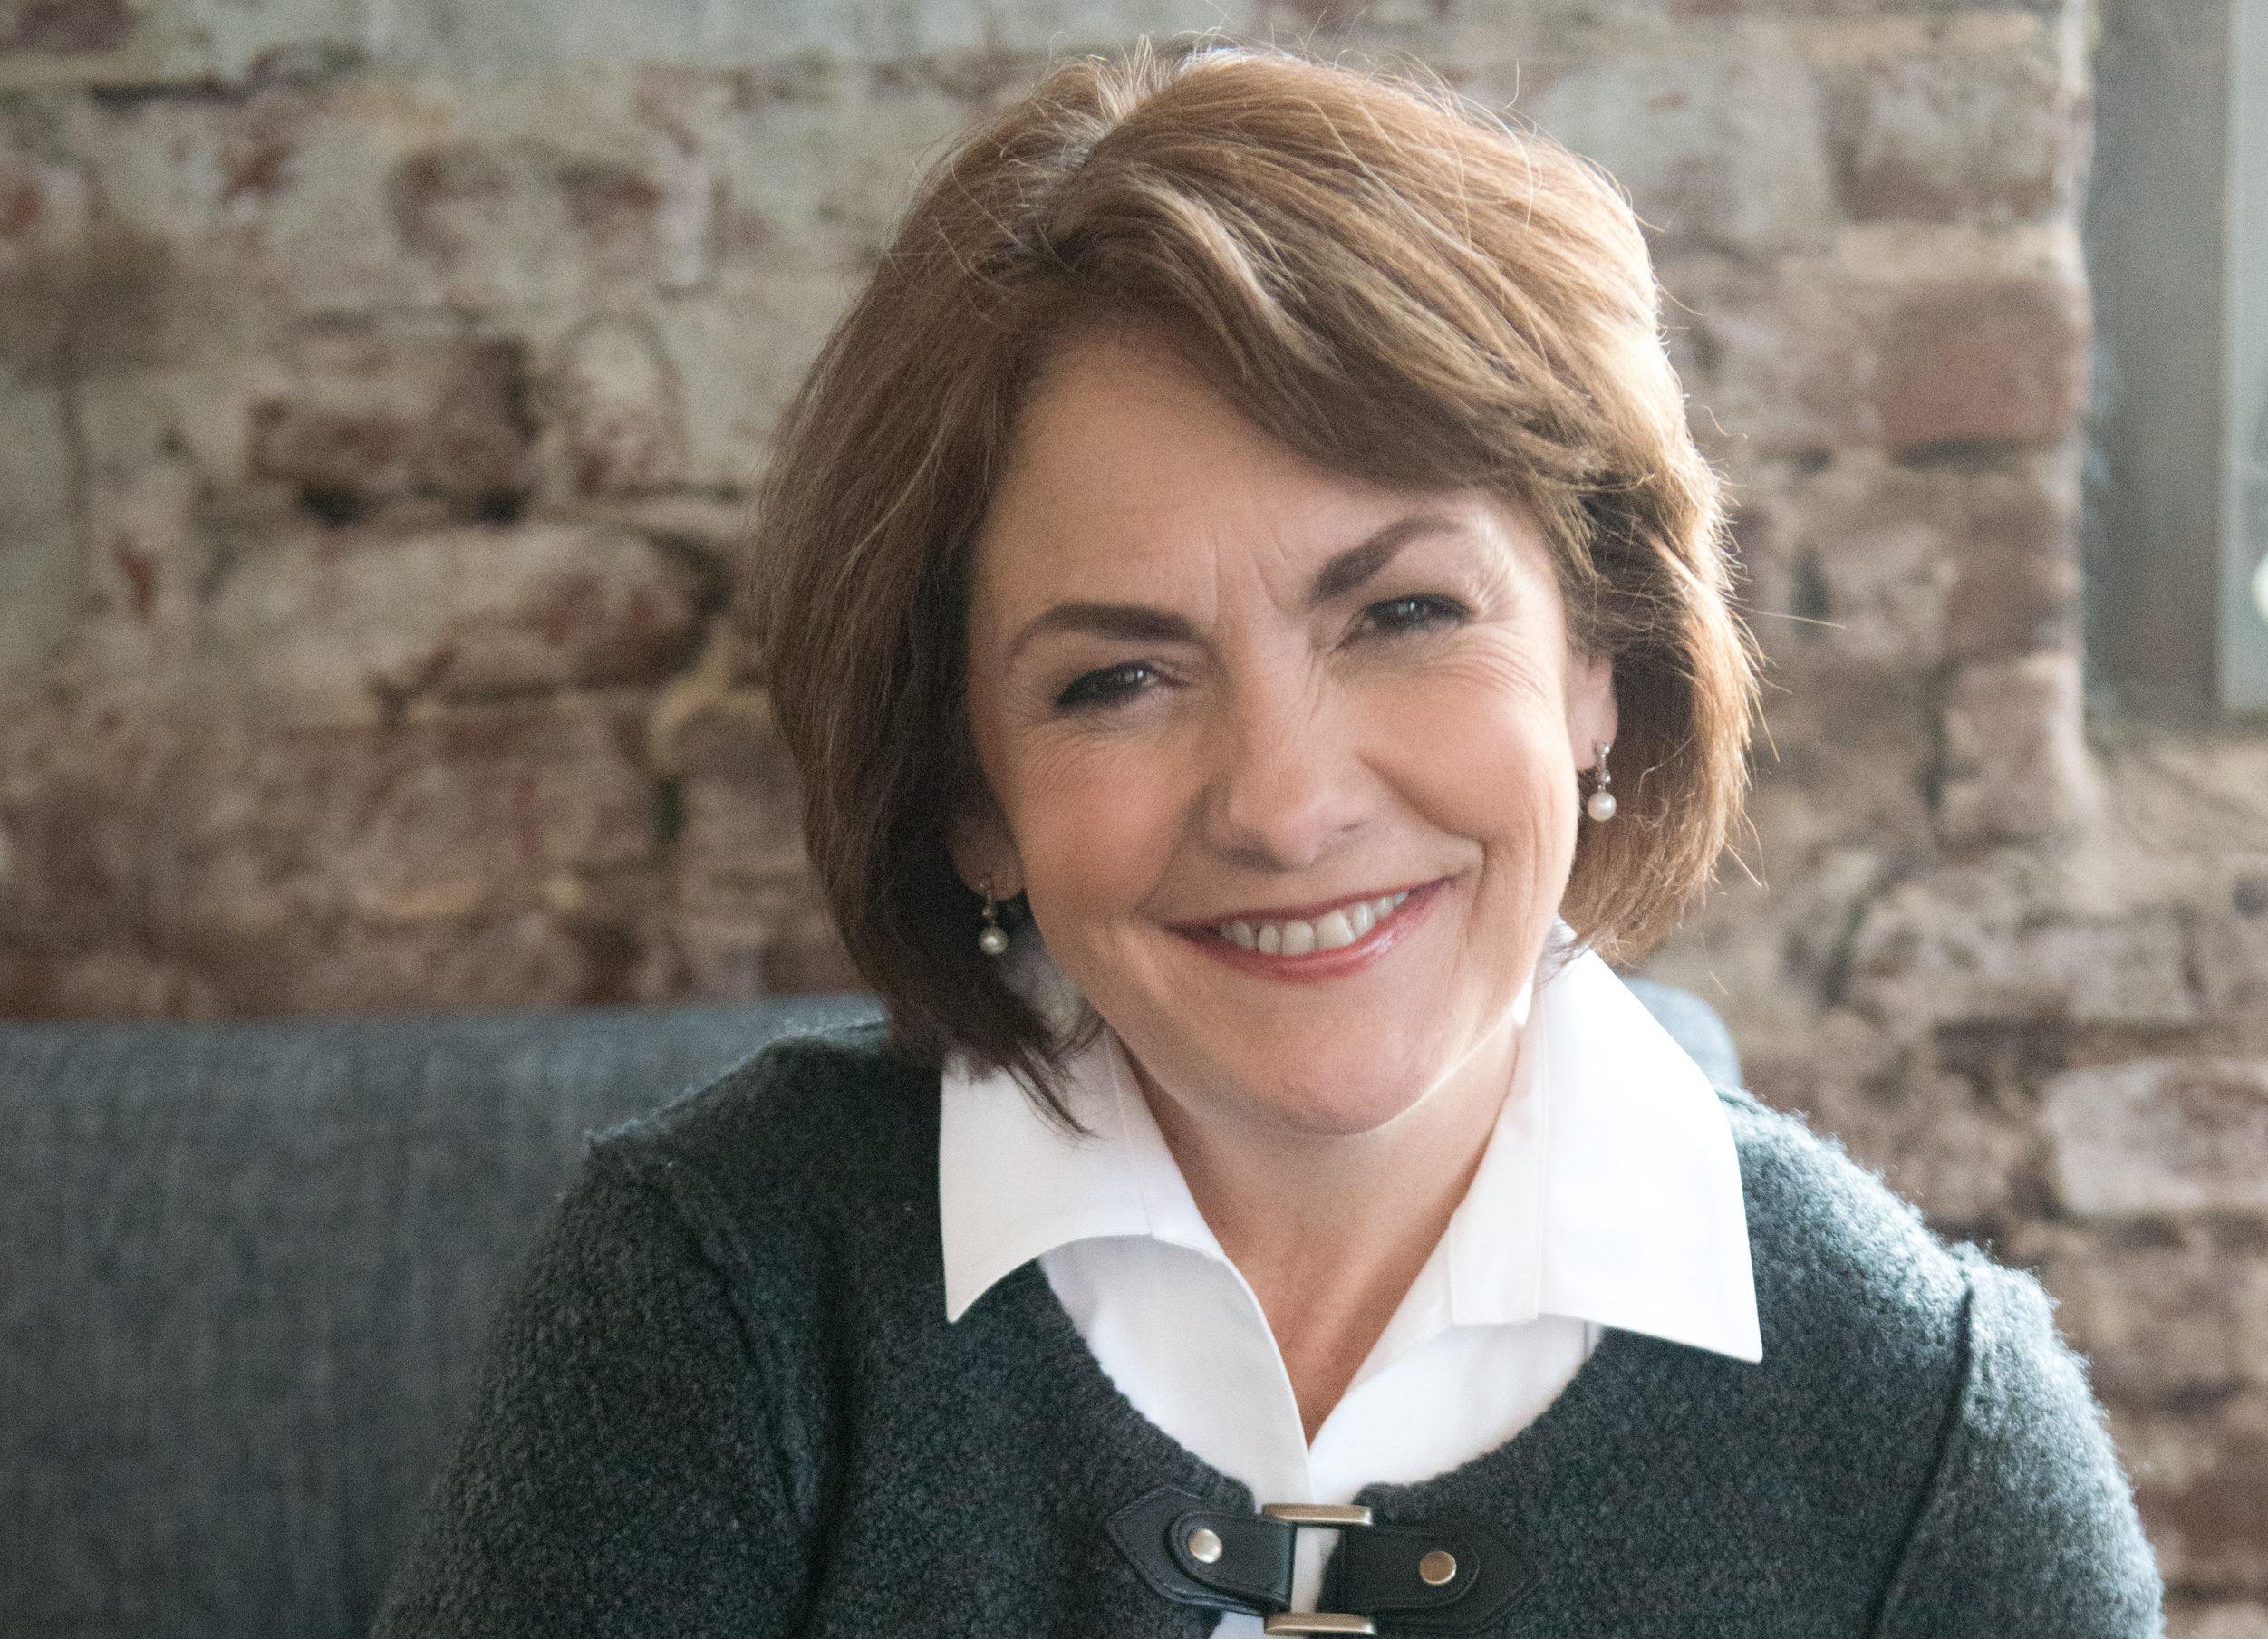 Neonatal nursing expert Mary Coughlin